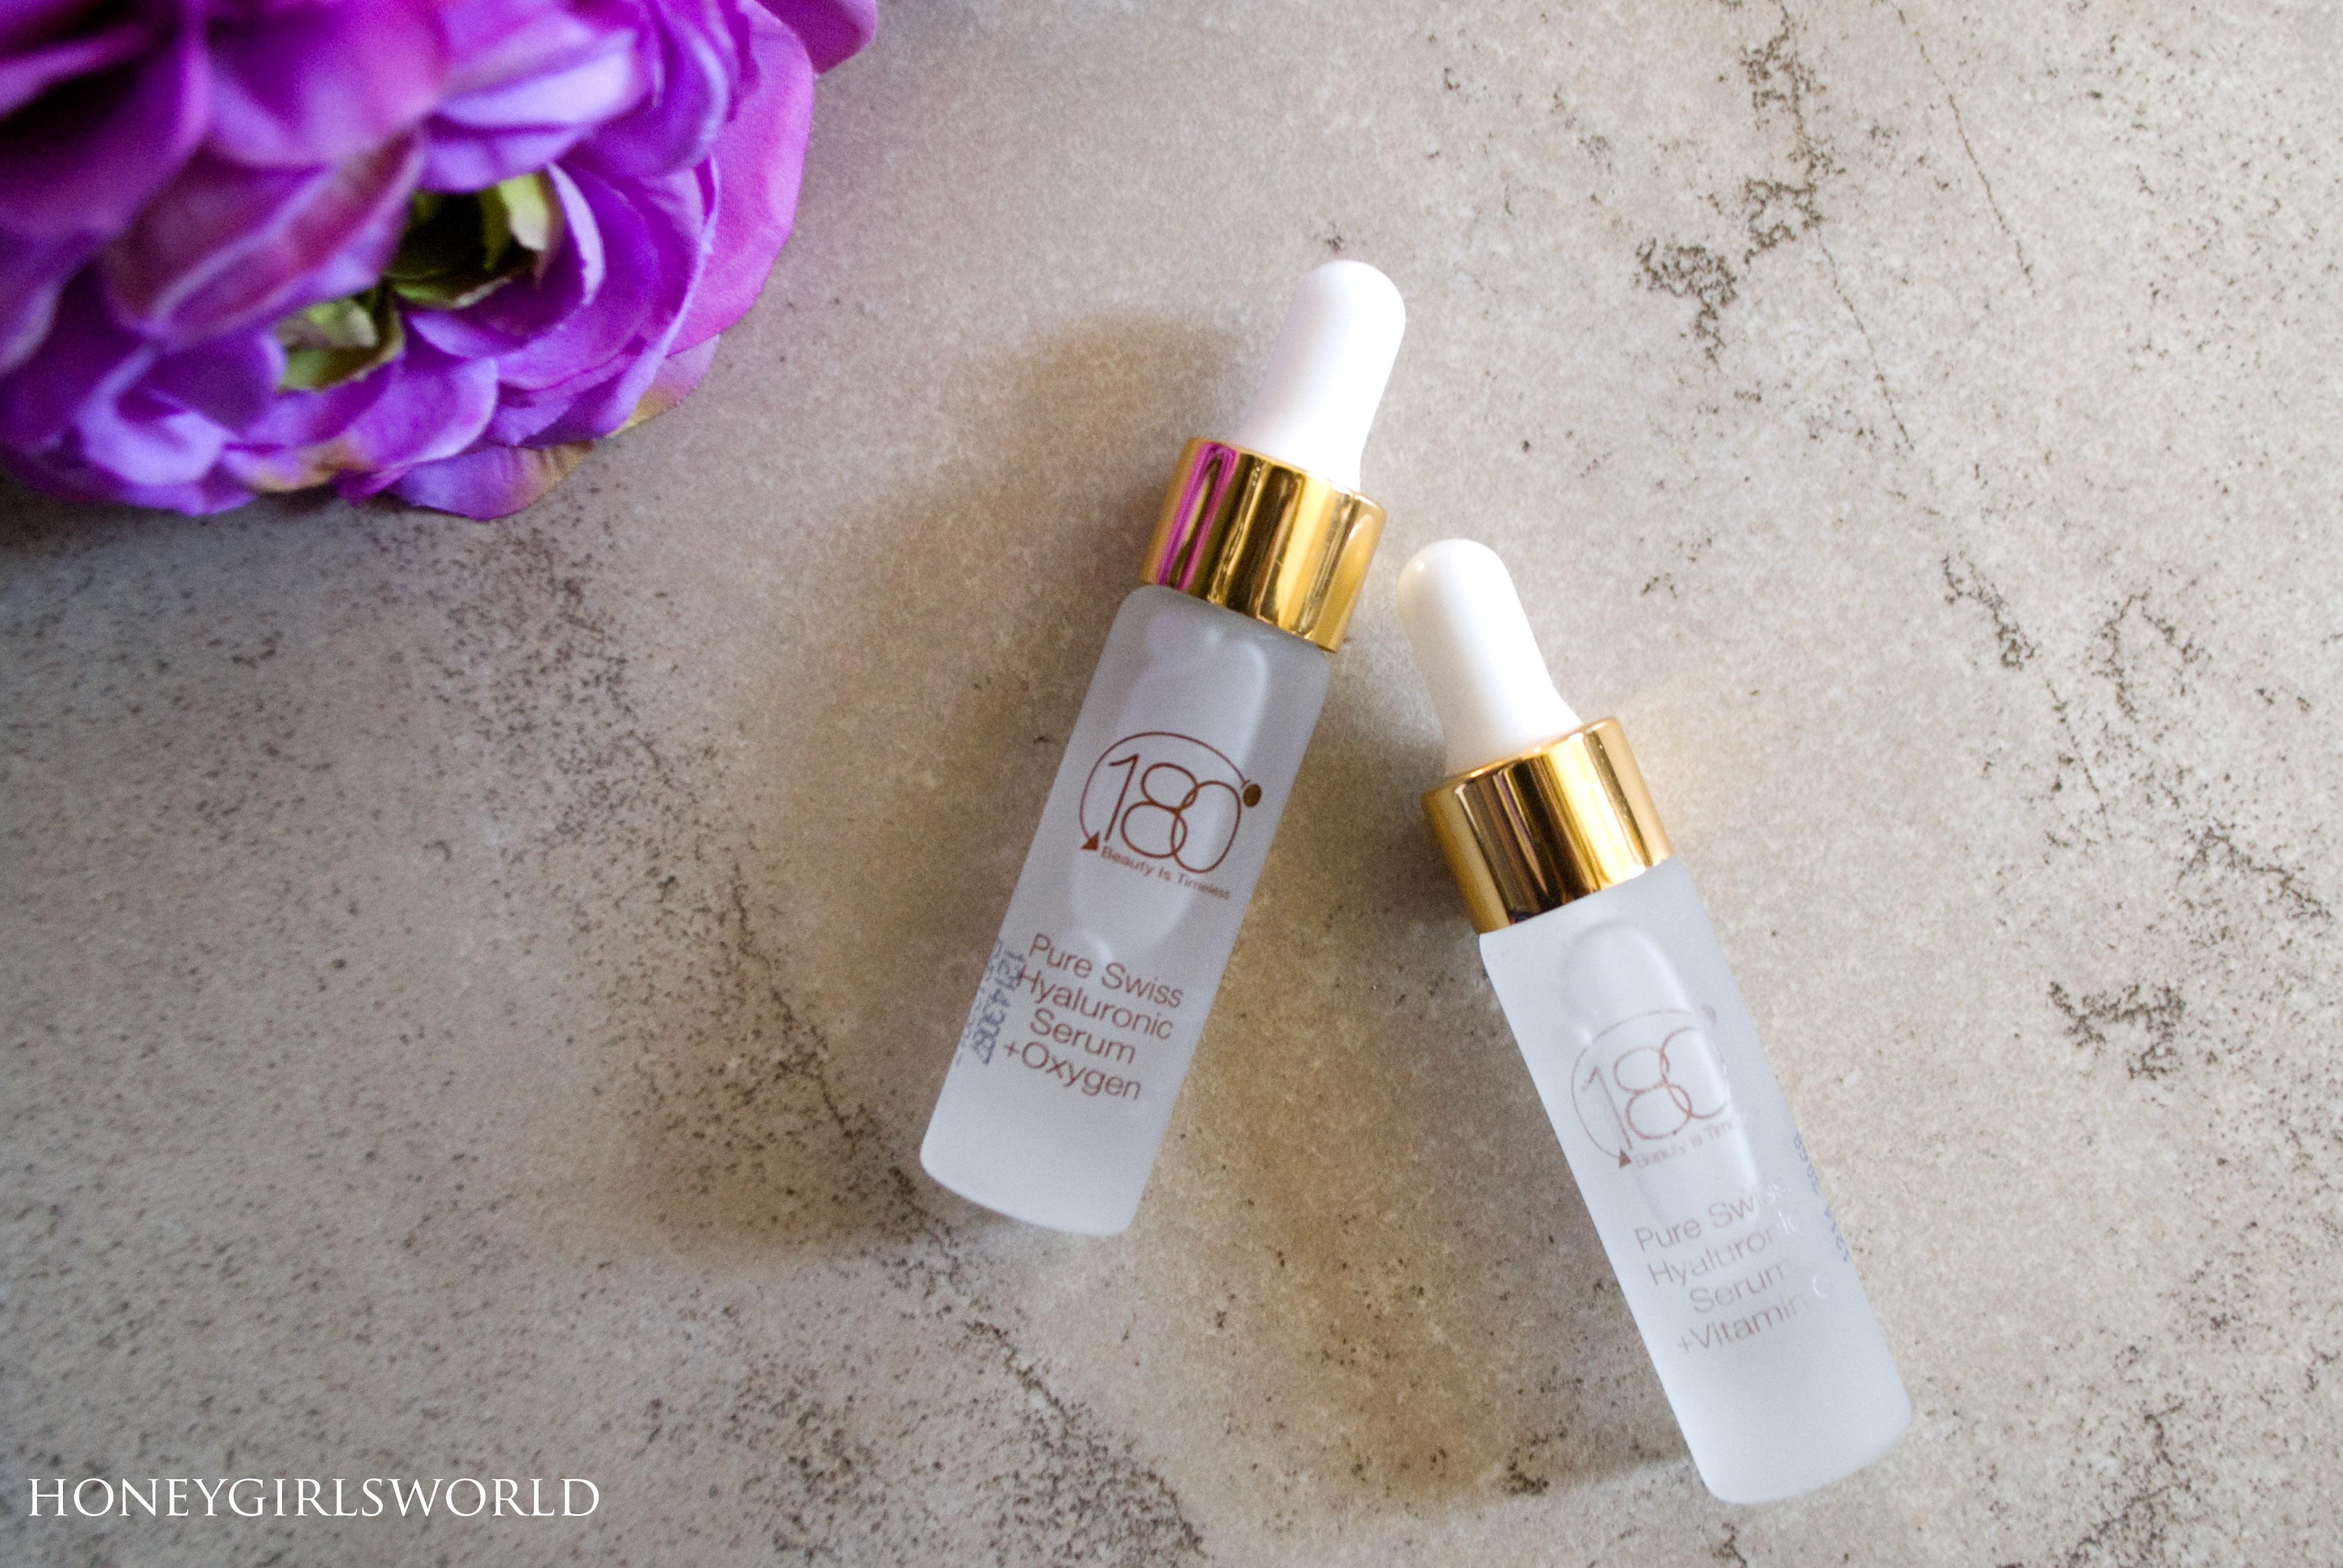 180 Cosmetics Pure Swiss Hyaluronic Acid Serums